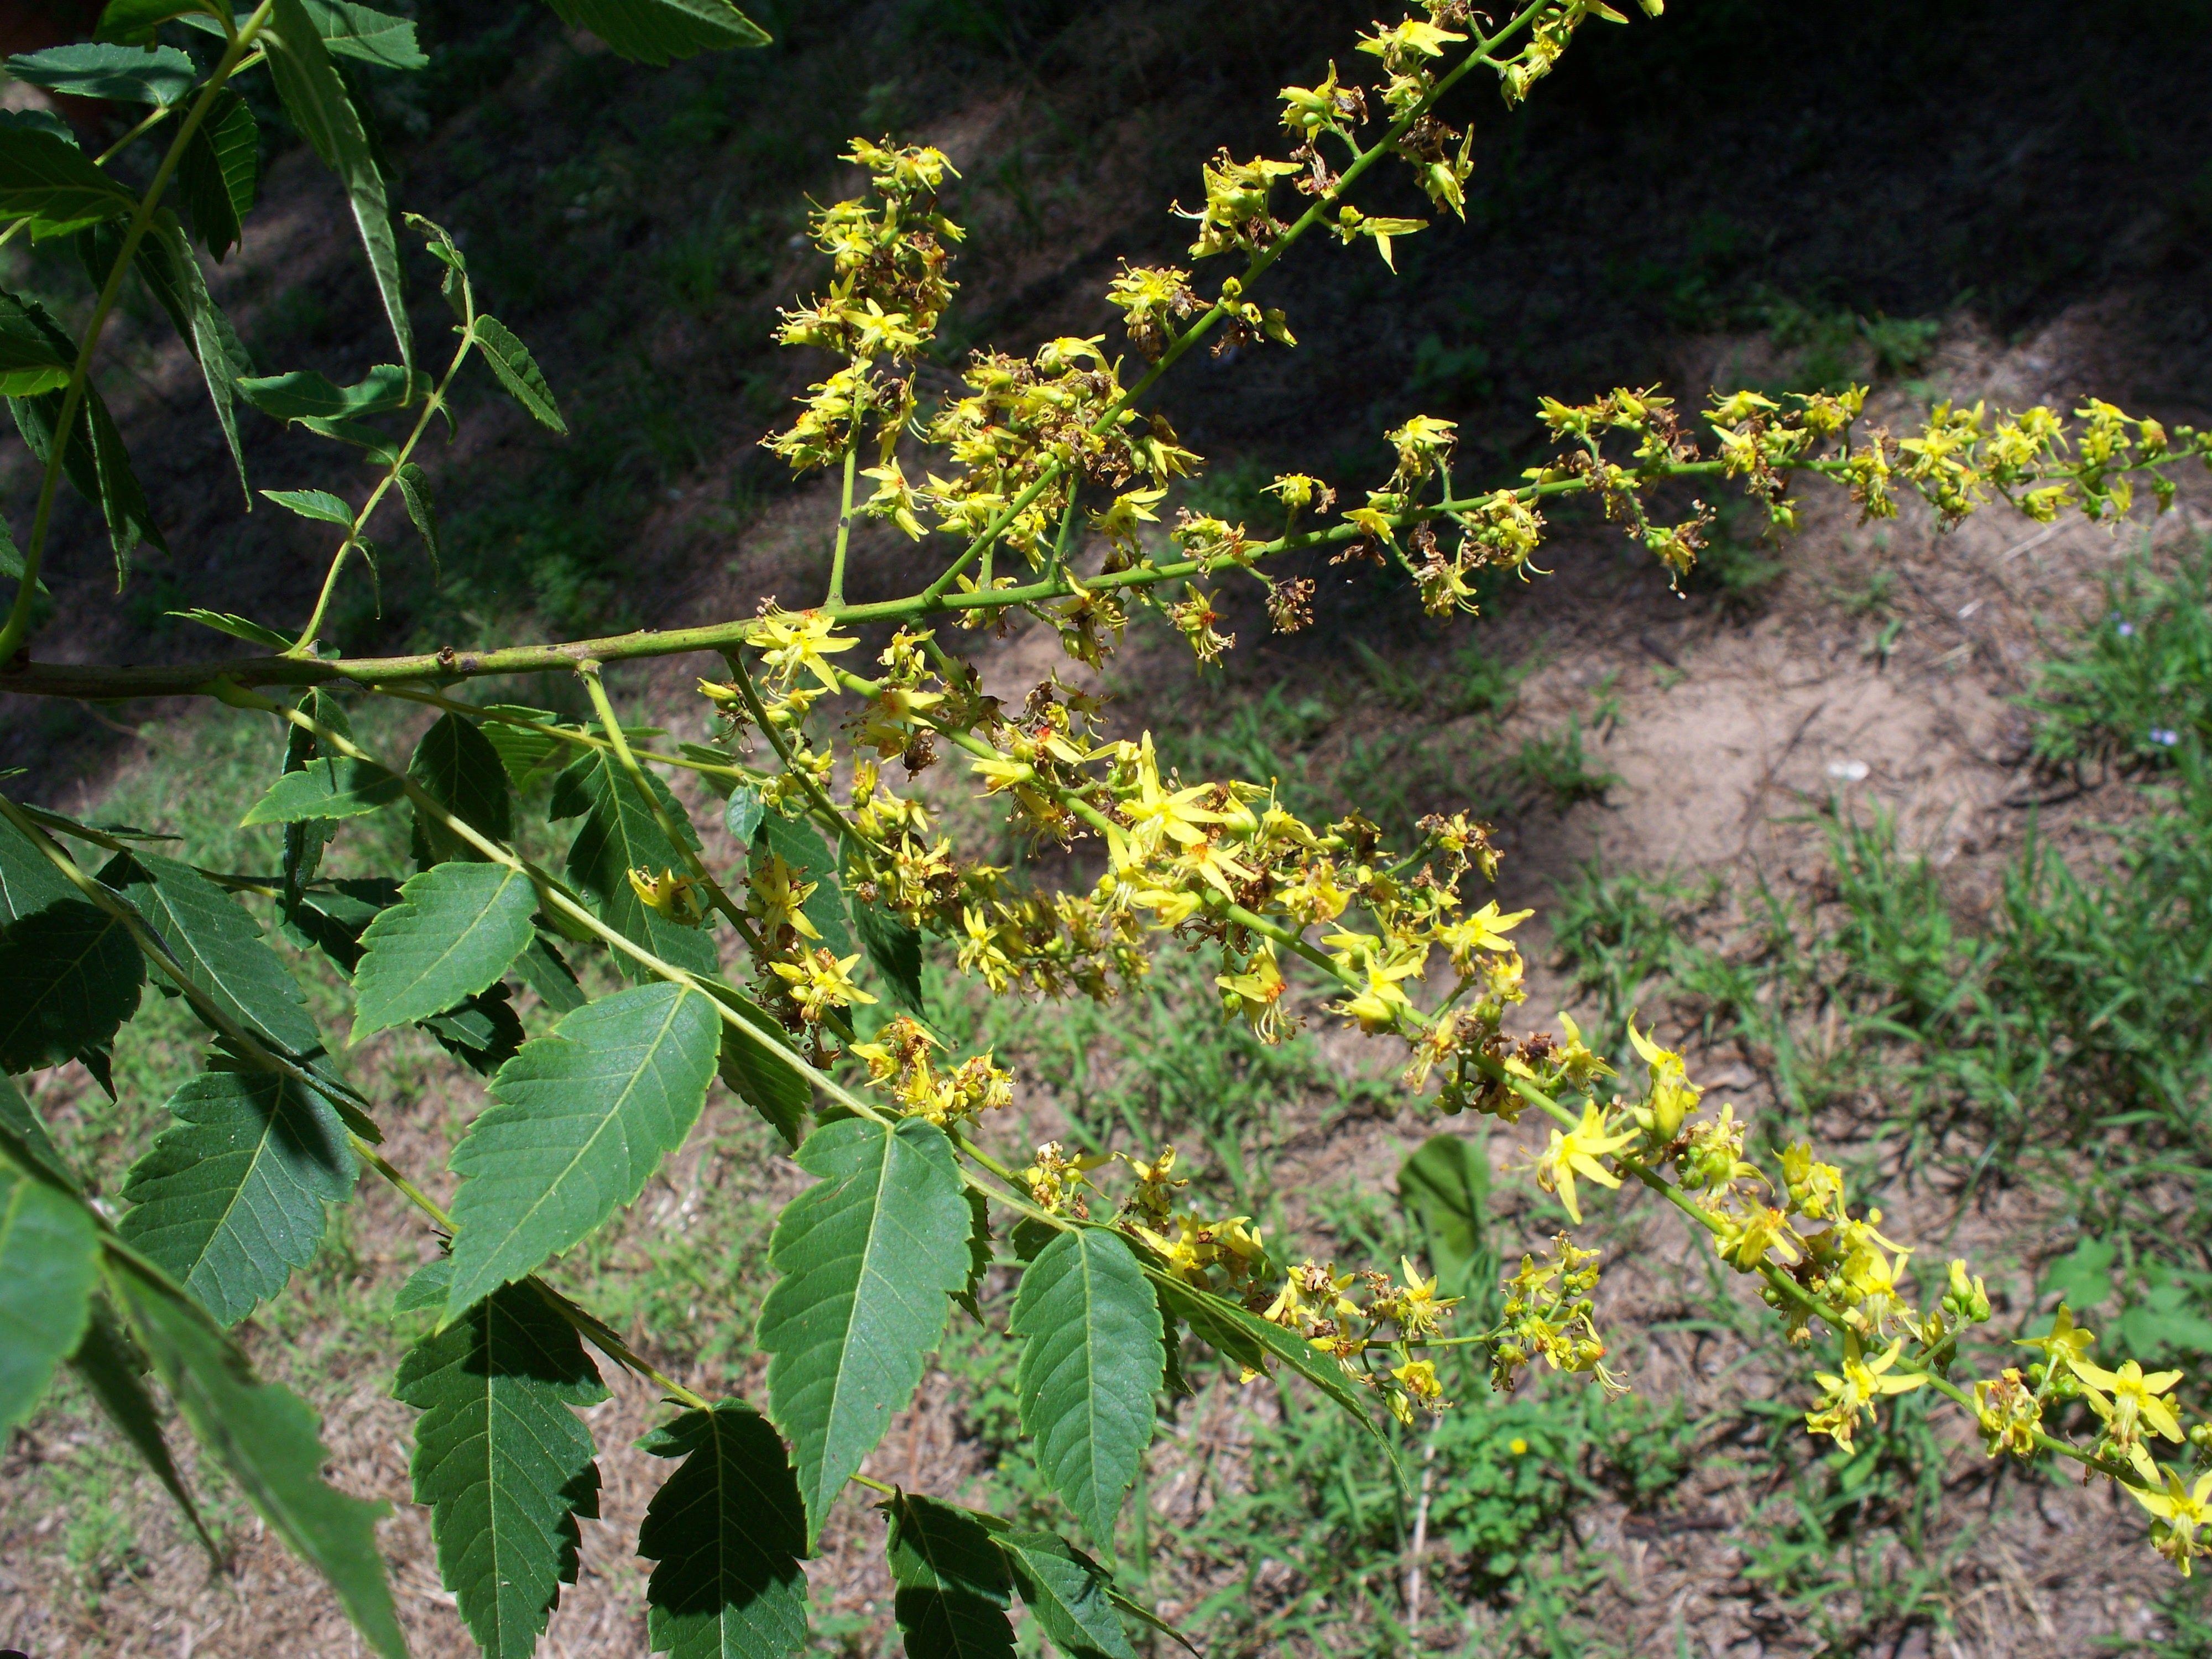 This is my tall tree like bush with yellow flowers that i am unable this is my tall tree like bush with yellow flowers that i am unable to identify mightylinksfo